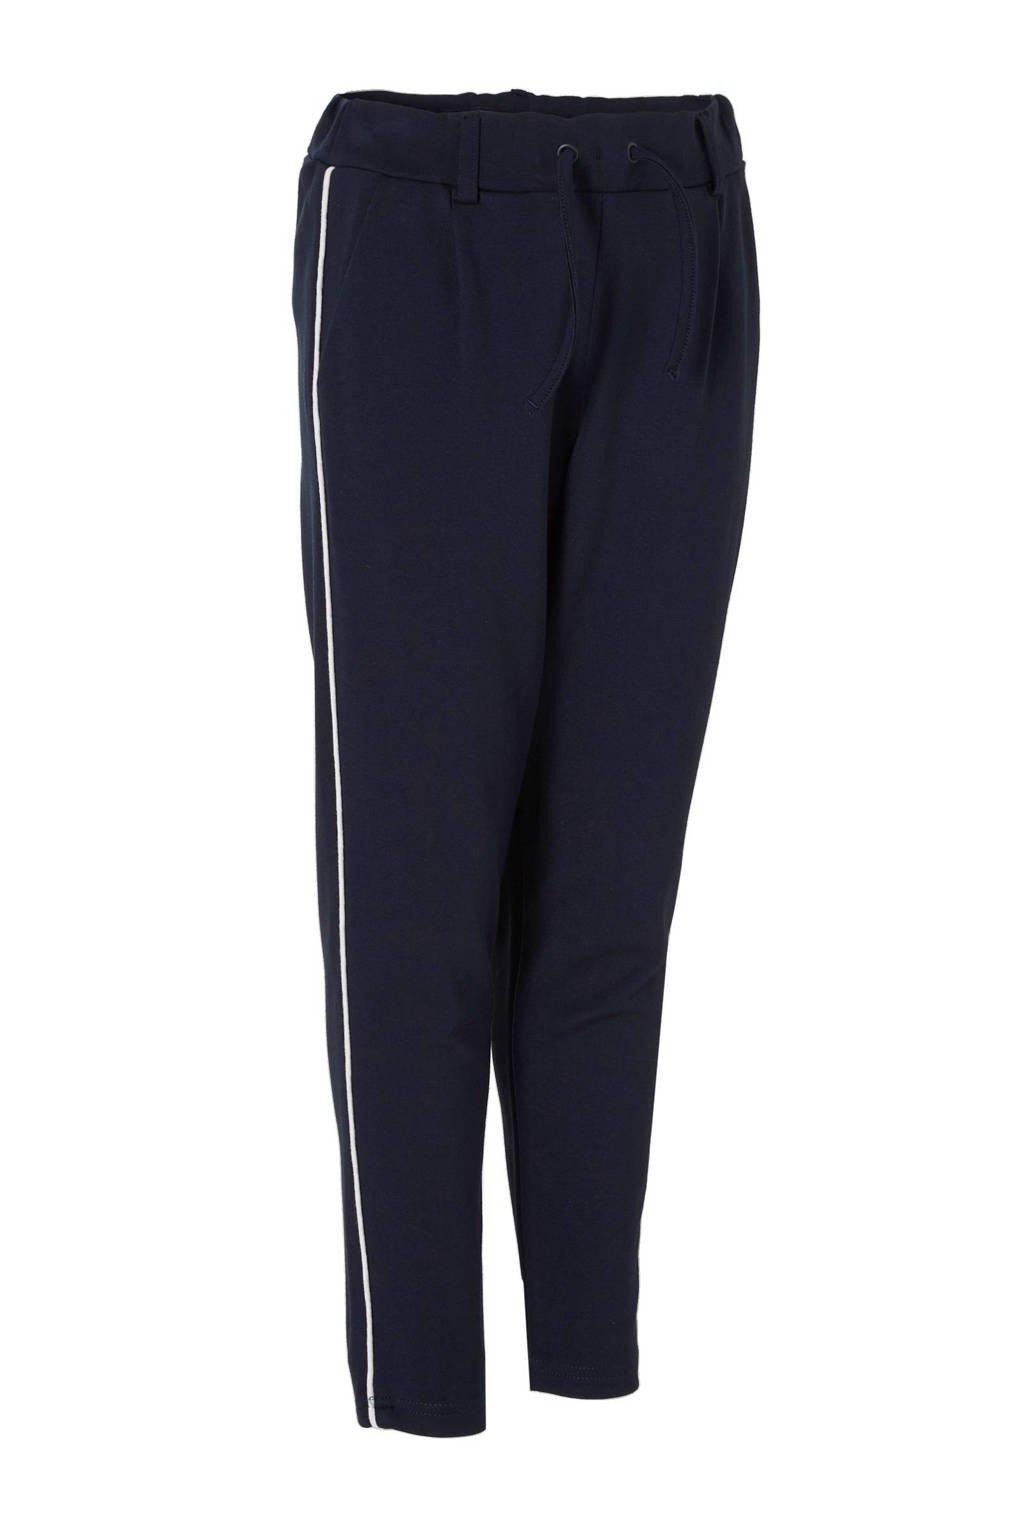 NAME IT KIDS loose fit sweatpants marine/wit, Marine/wit